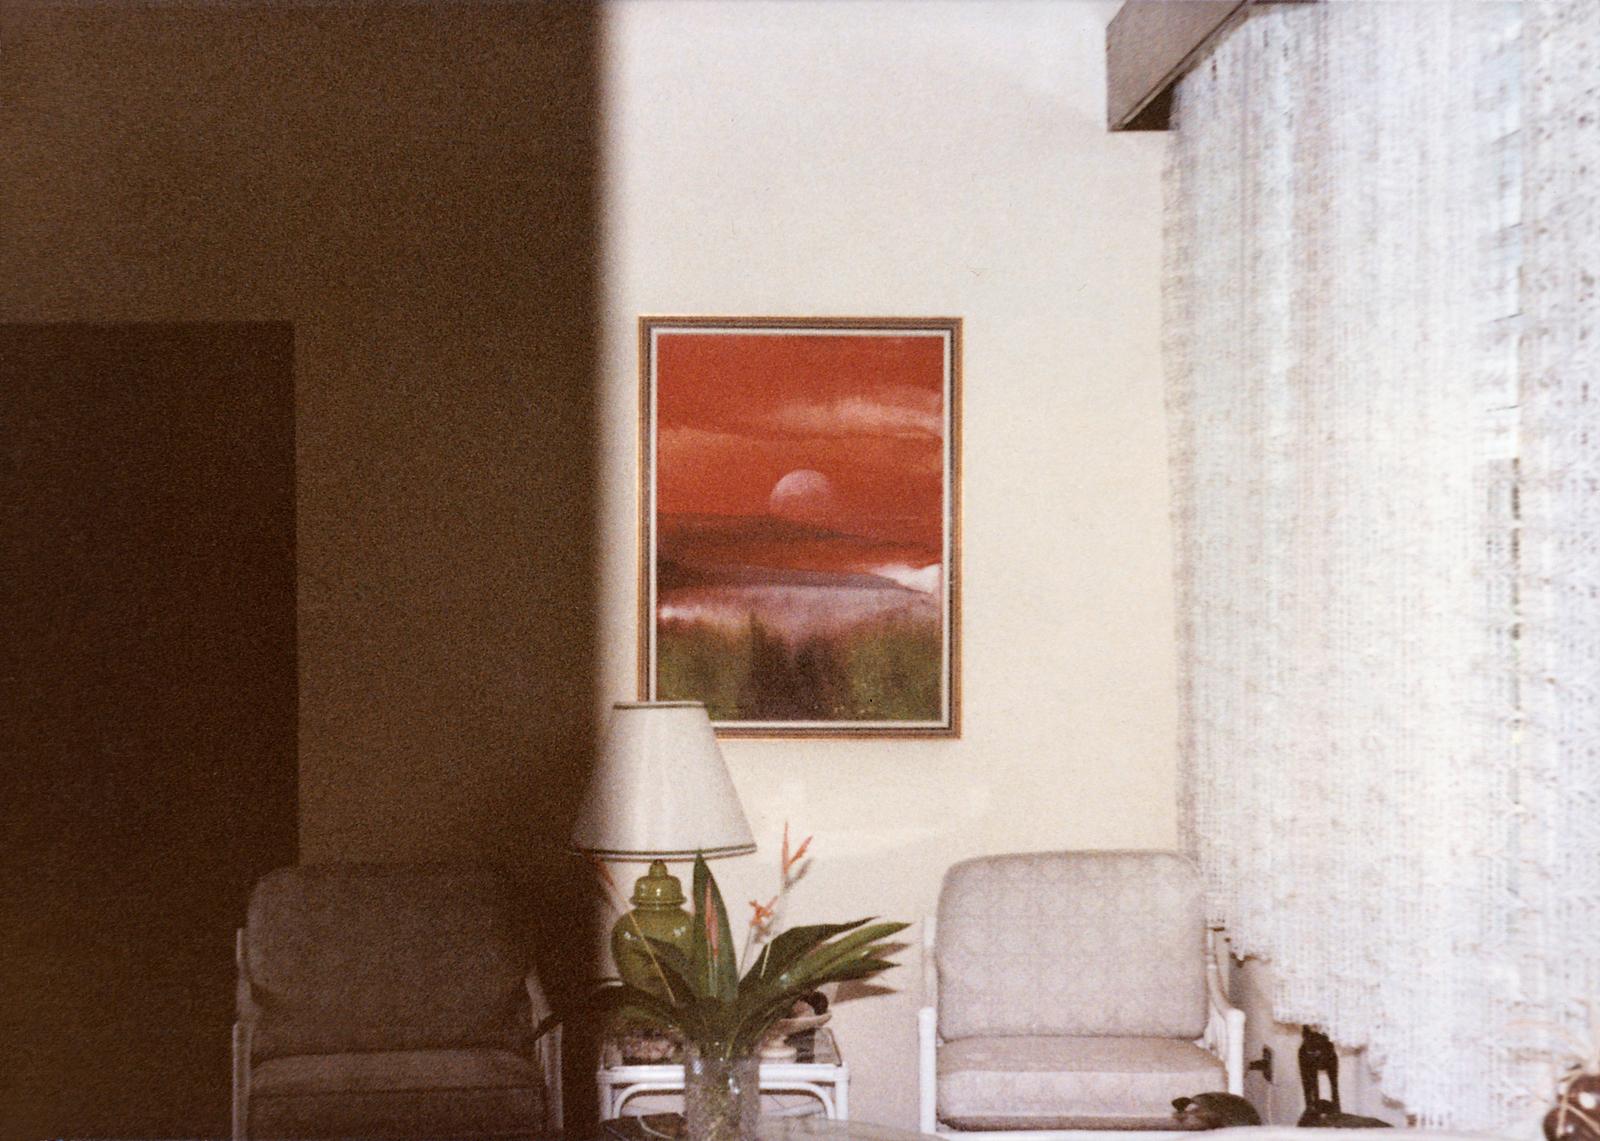 Lome - Standard Level Position Residence - 1982